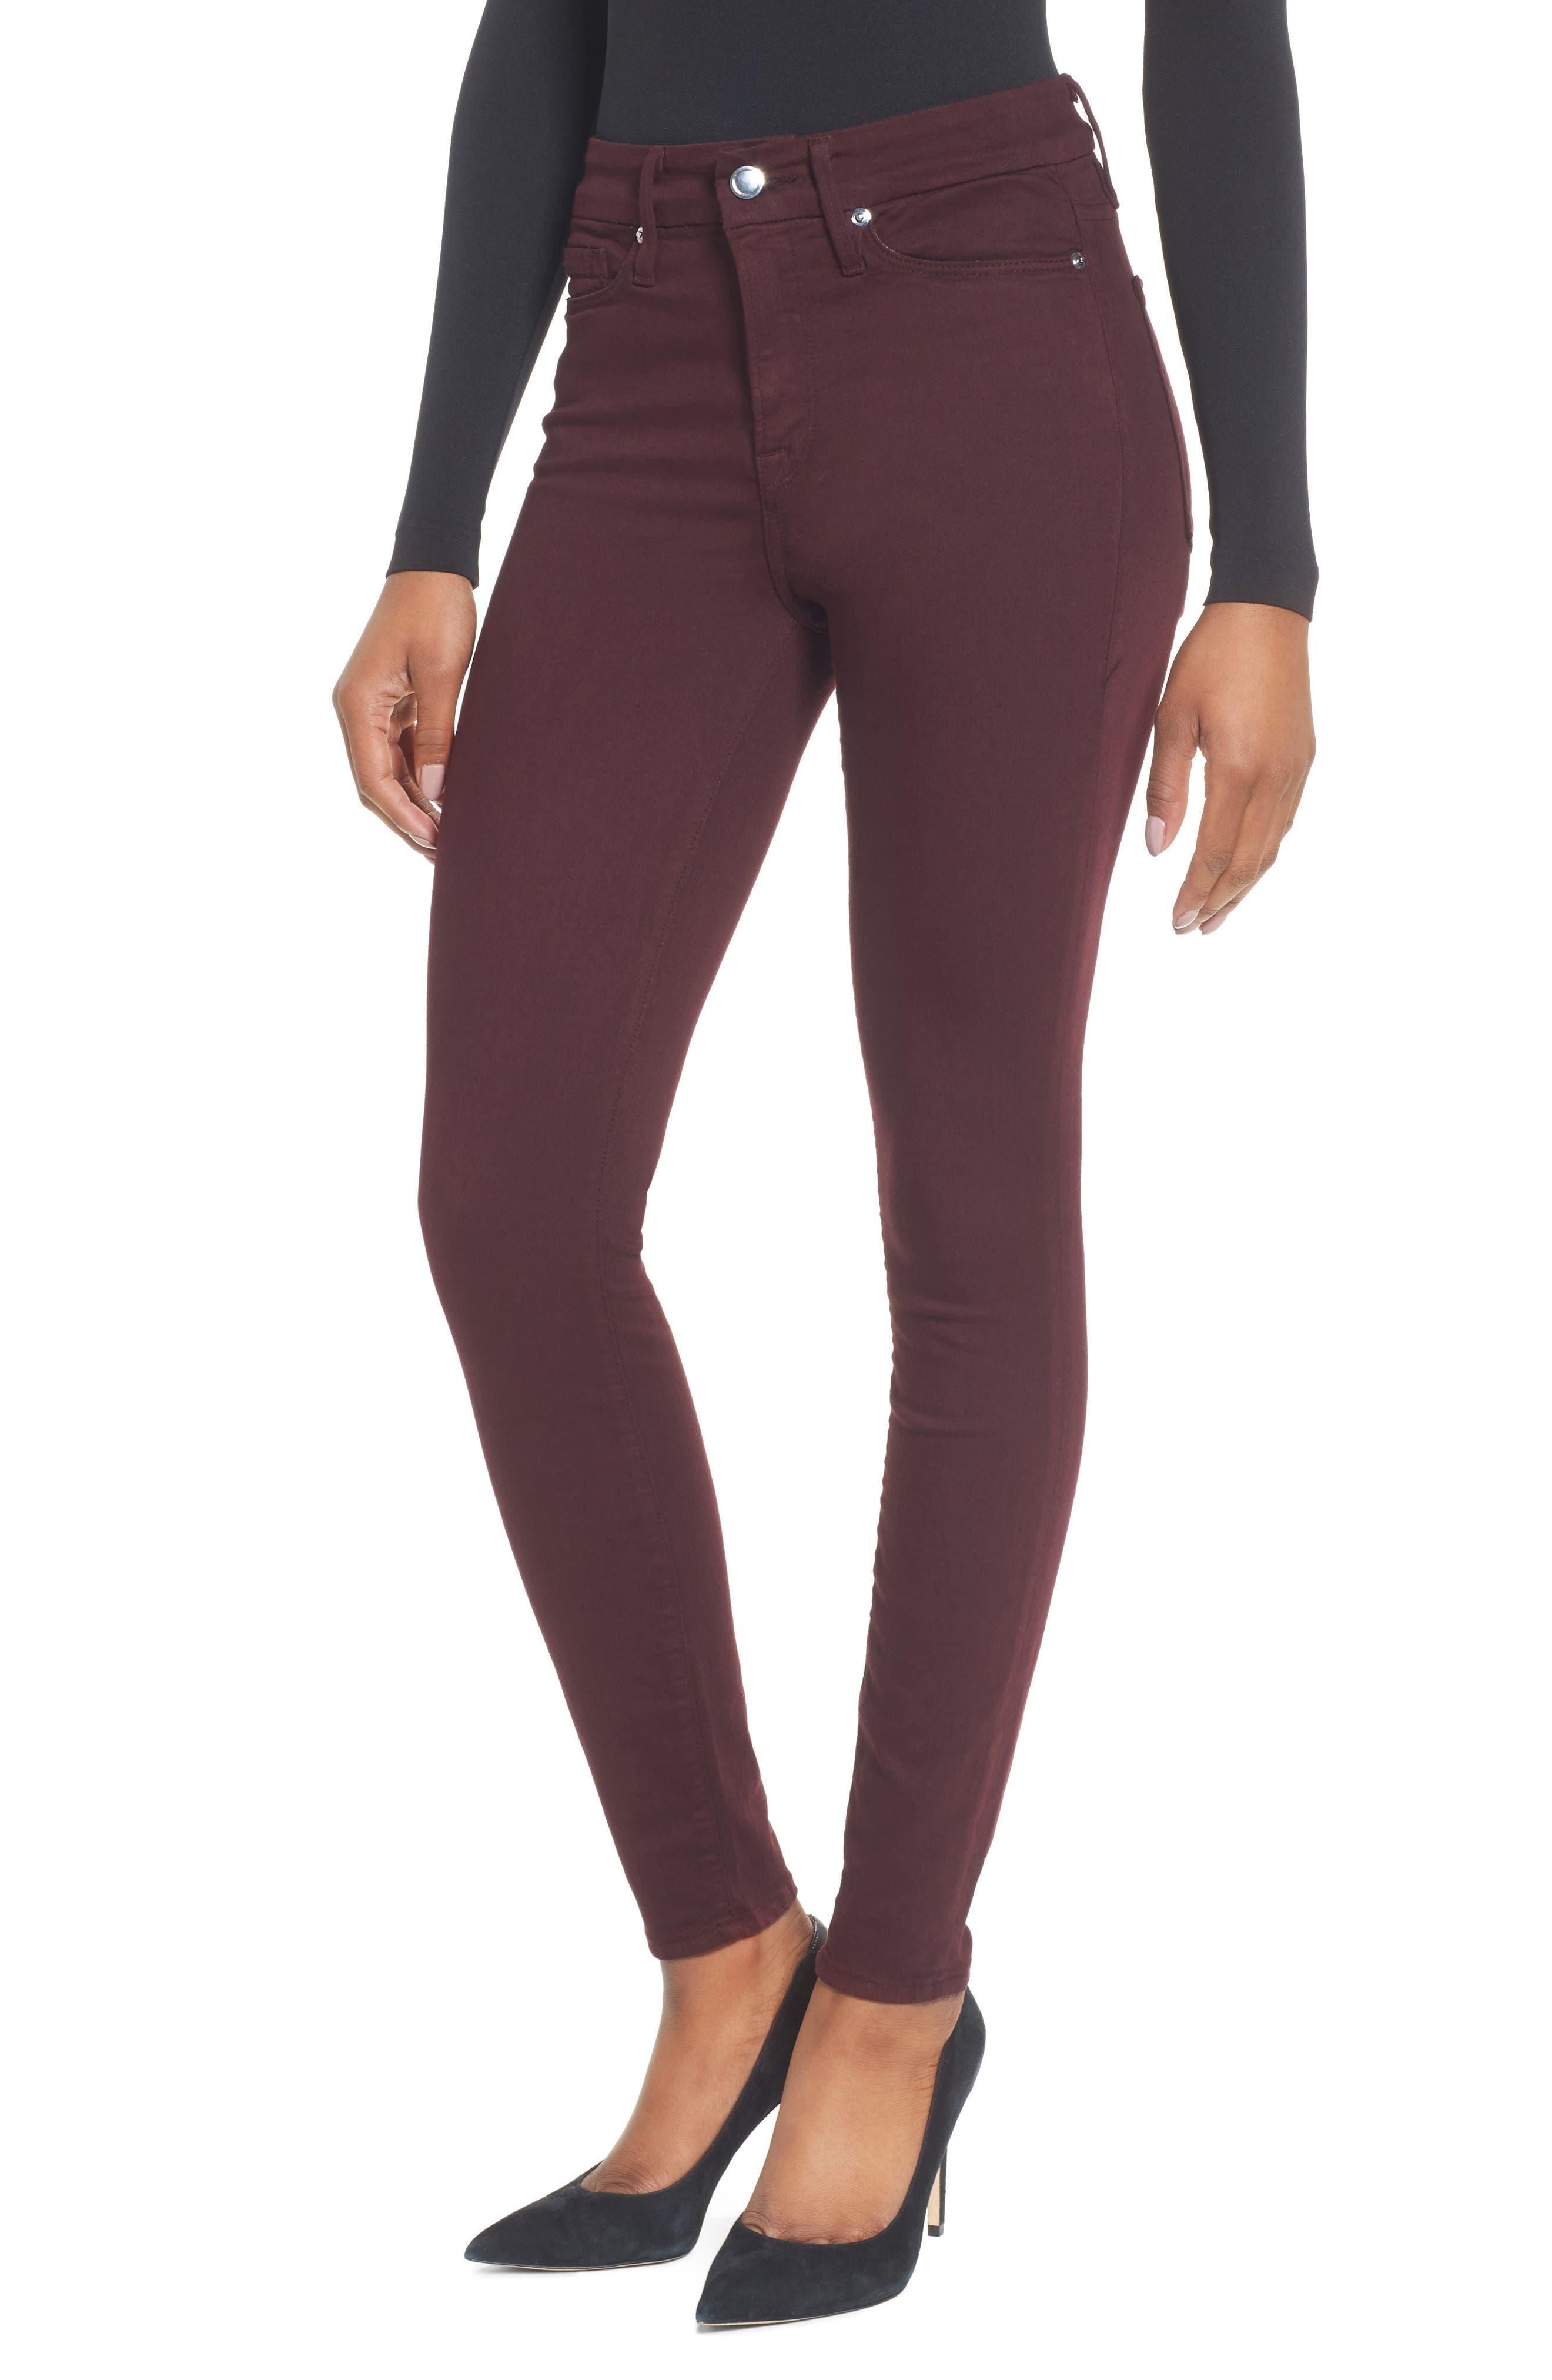 Main Image - Good American Good Legs High Waist Skinny Jeans (Burgundy 001) (Regular & Plus Size)